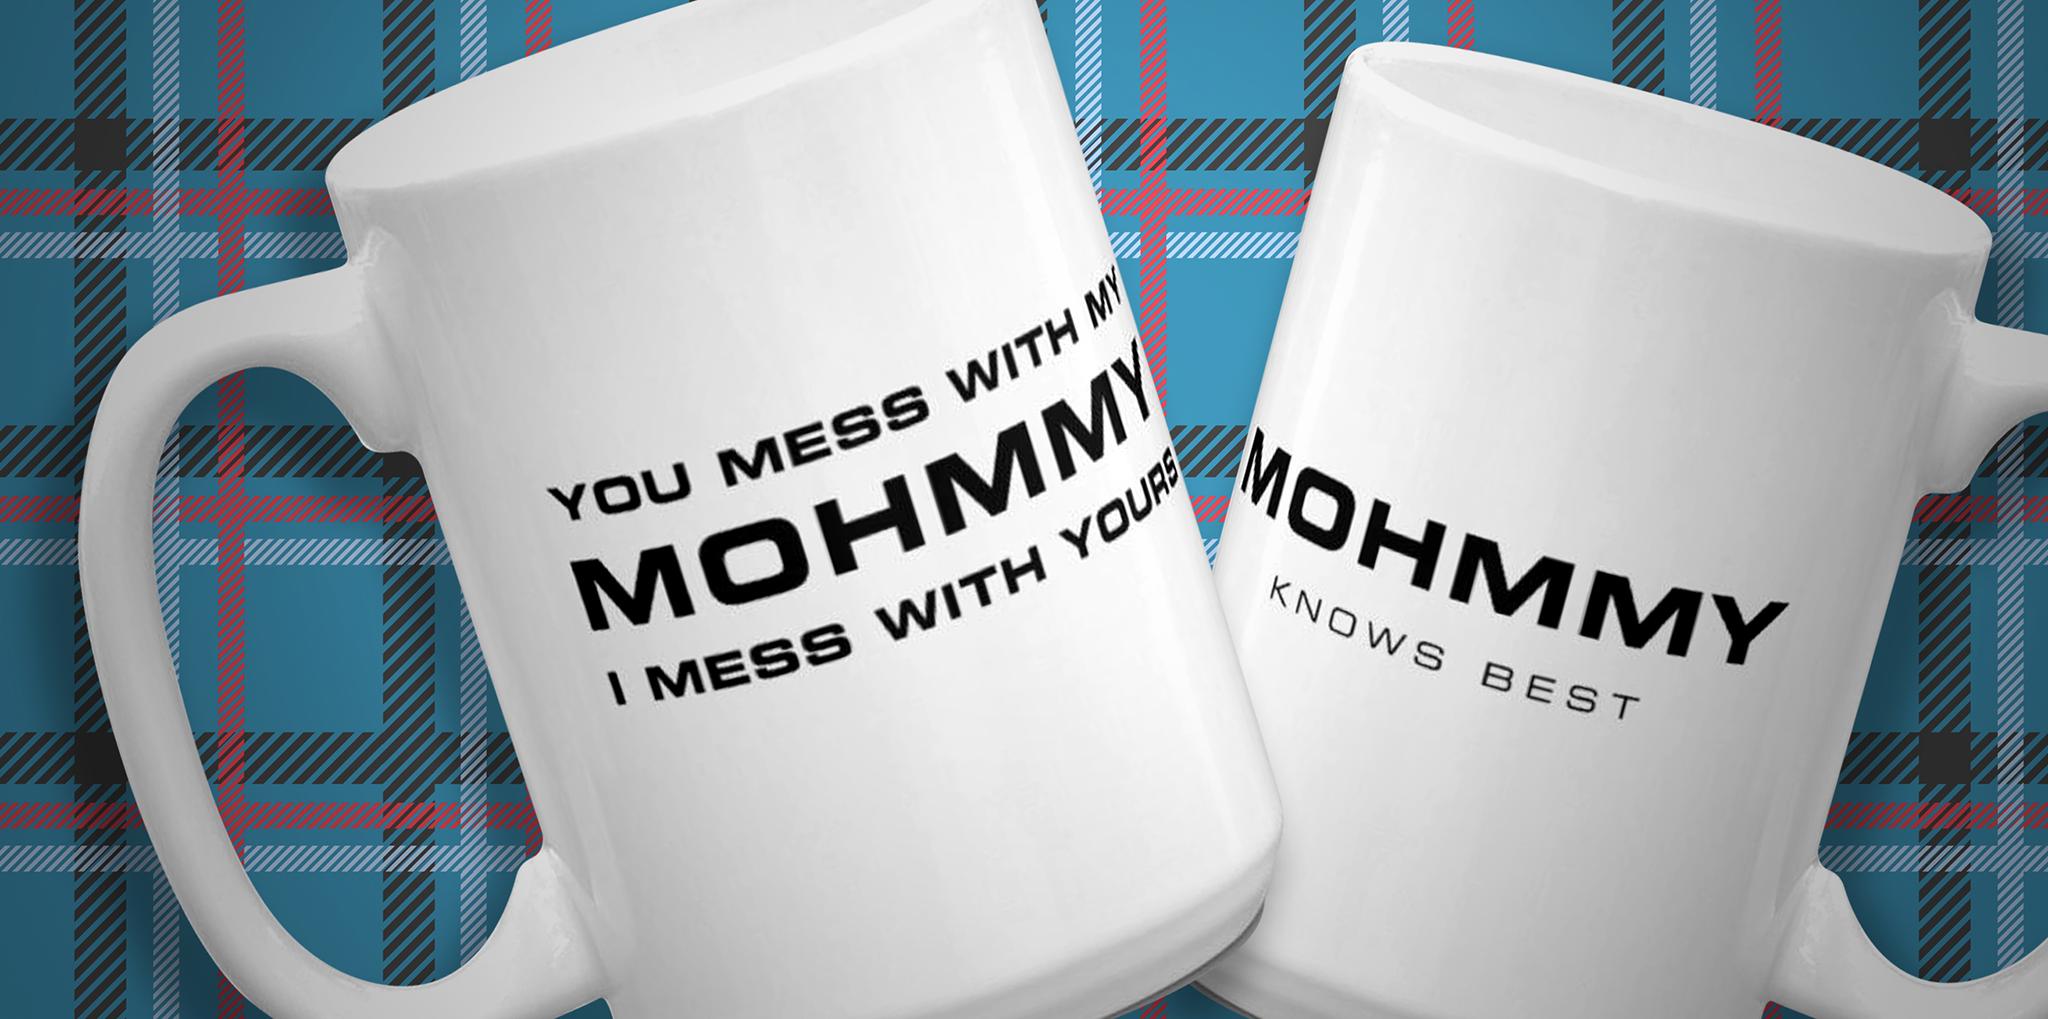 Mom_Gifts-Whimsical_Mommy_Mugs-MOHMMY-S.jpg